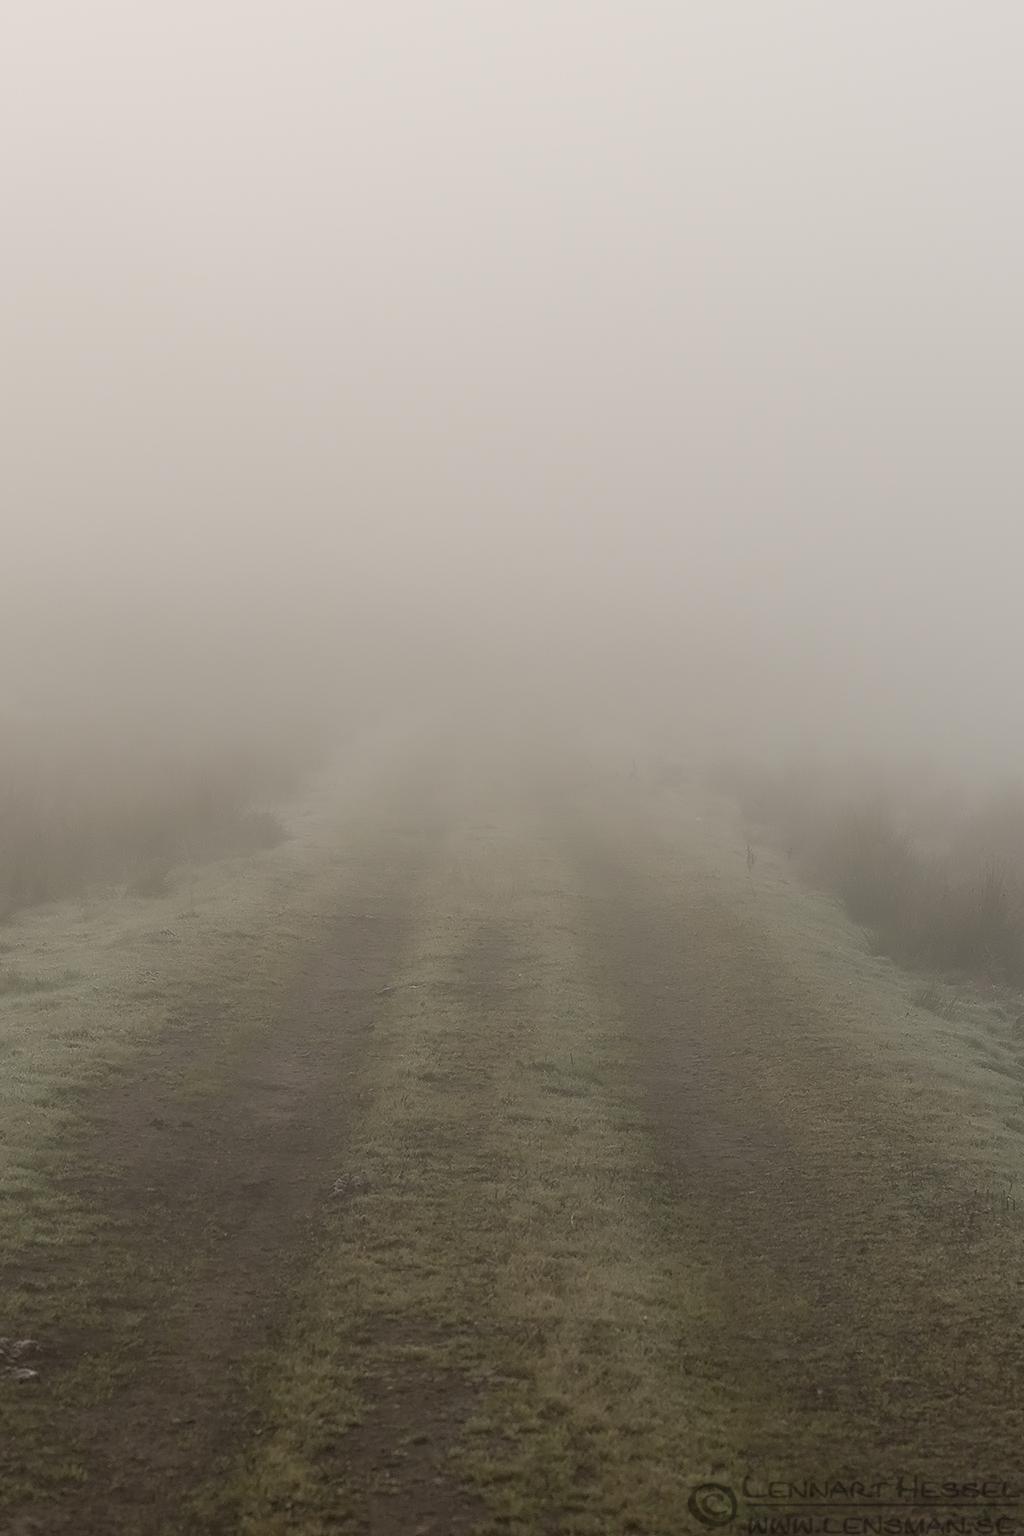 Disapperaing road fog